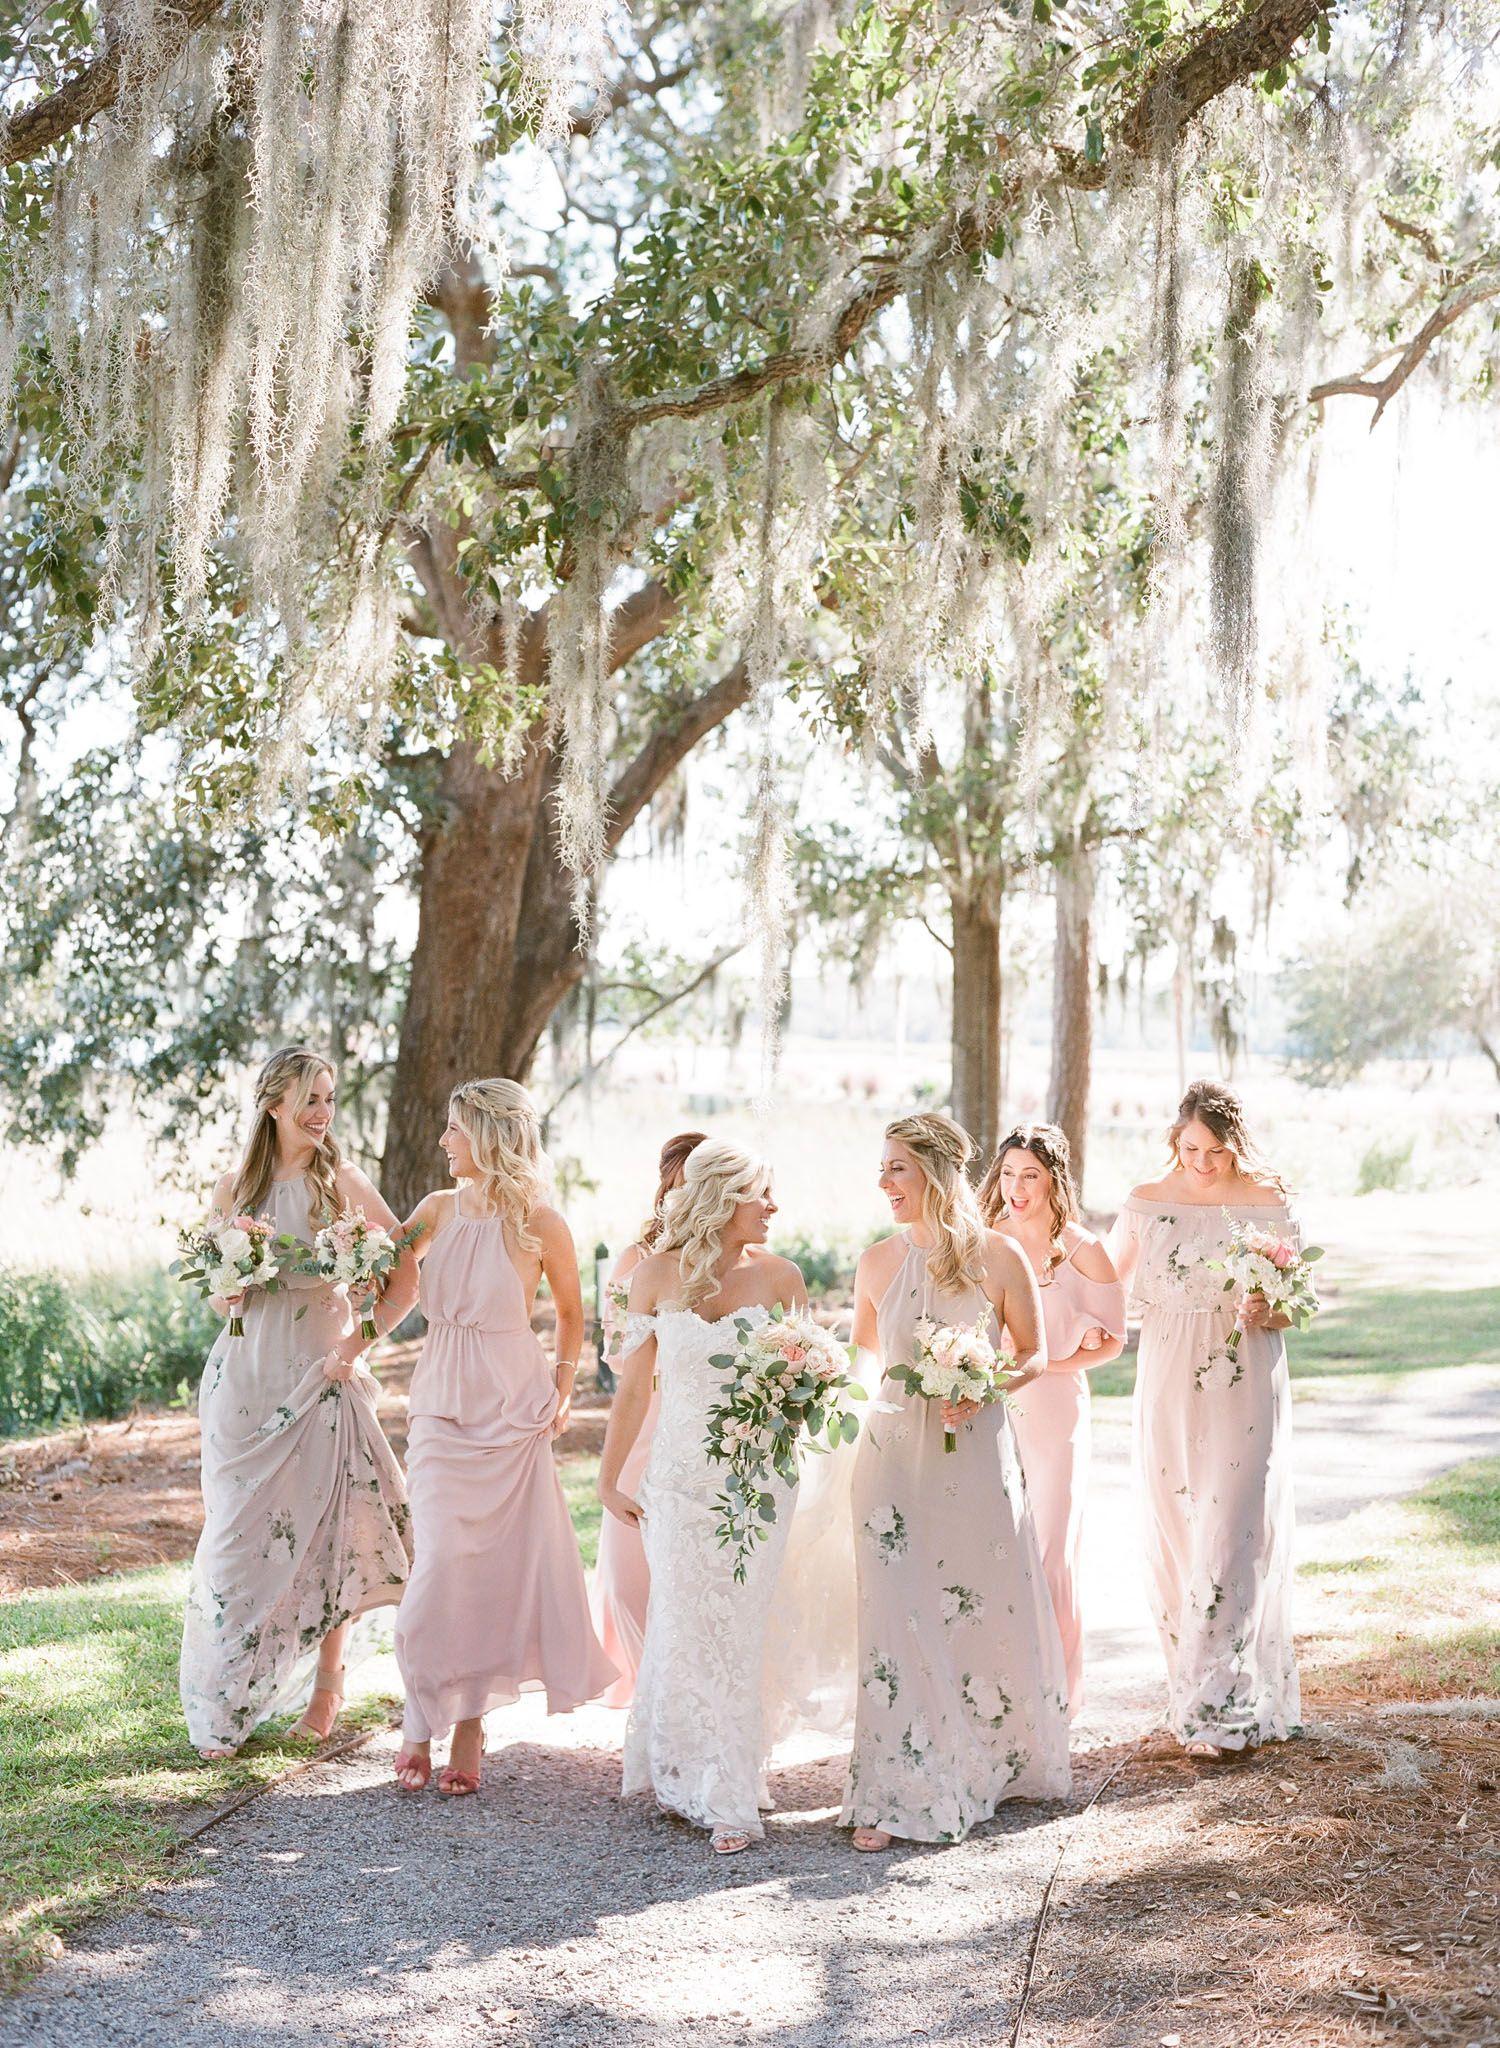 South Carolina Wedding Oldfield Planation Venue Photo By The Happy Bloom Husband Wedding Venues South Carolina Lowcountry Wedding South Carolina Wedding